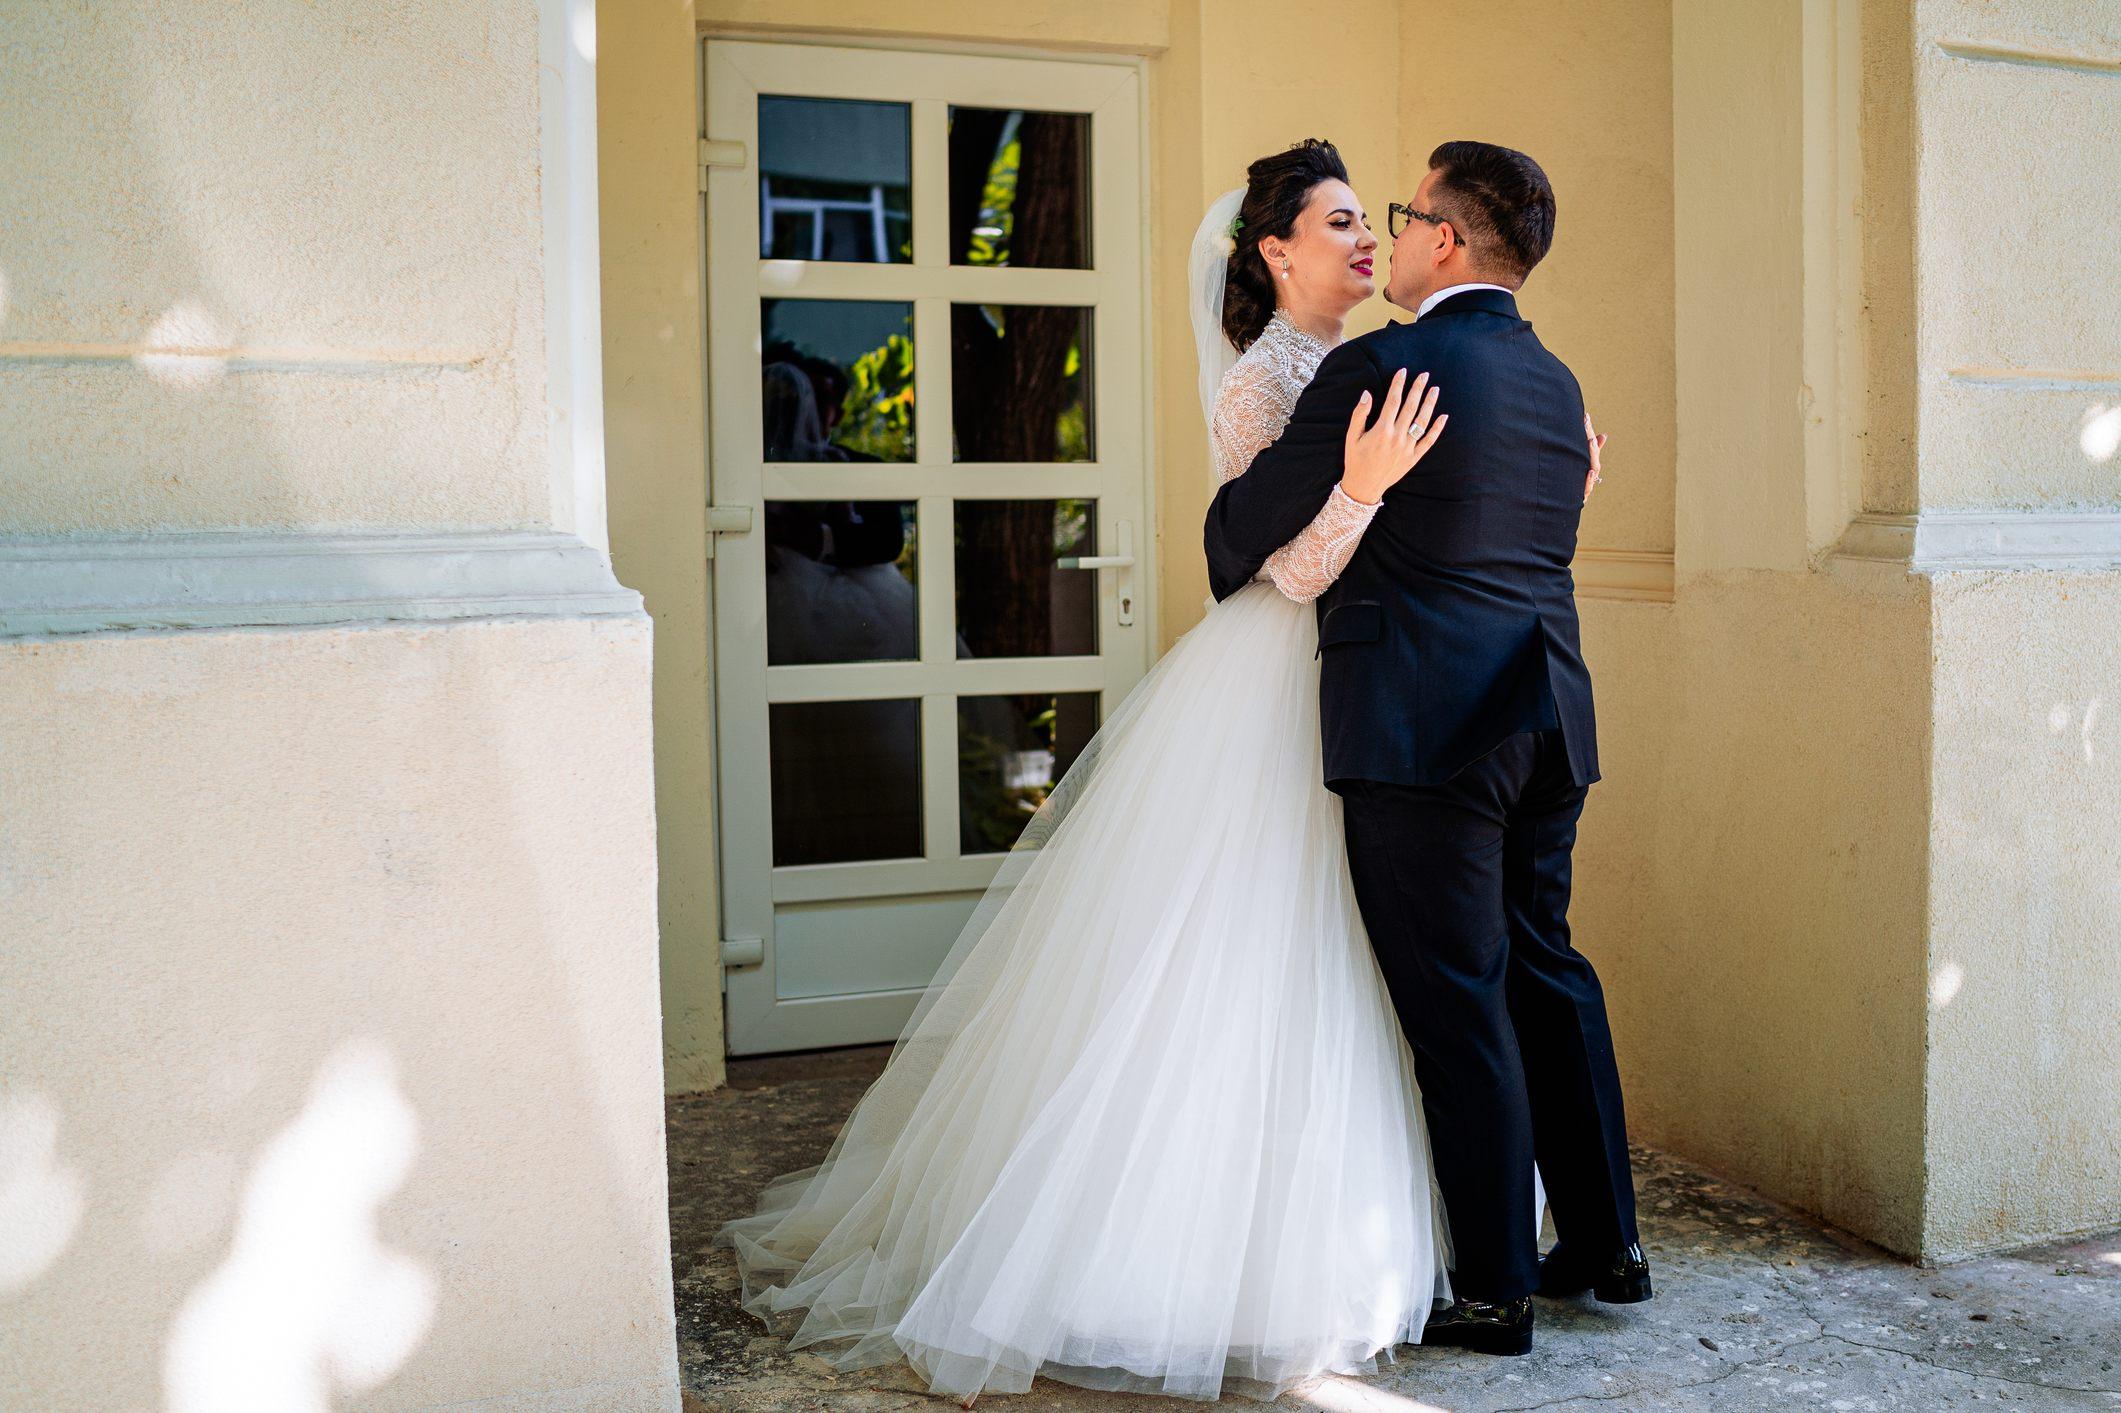 fotograf nunta bucuresti laurentiu nica  6 - Lorena & Matei | Fotografii nunta Bucuresti | Restaurant Domeniul cu Ciresi